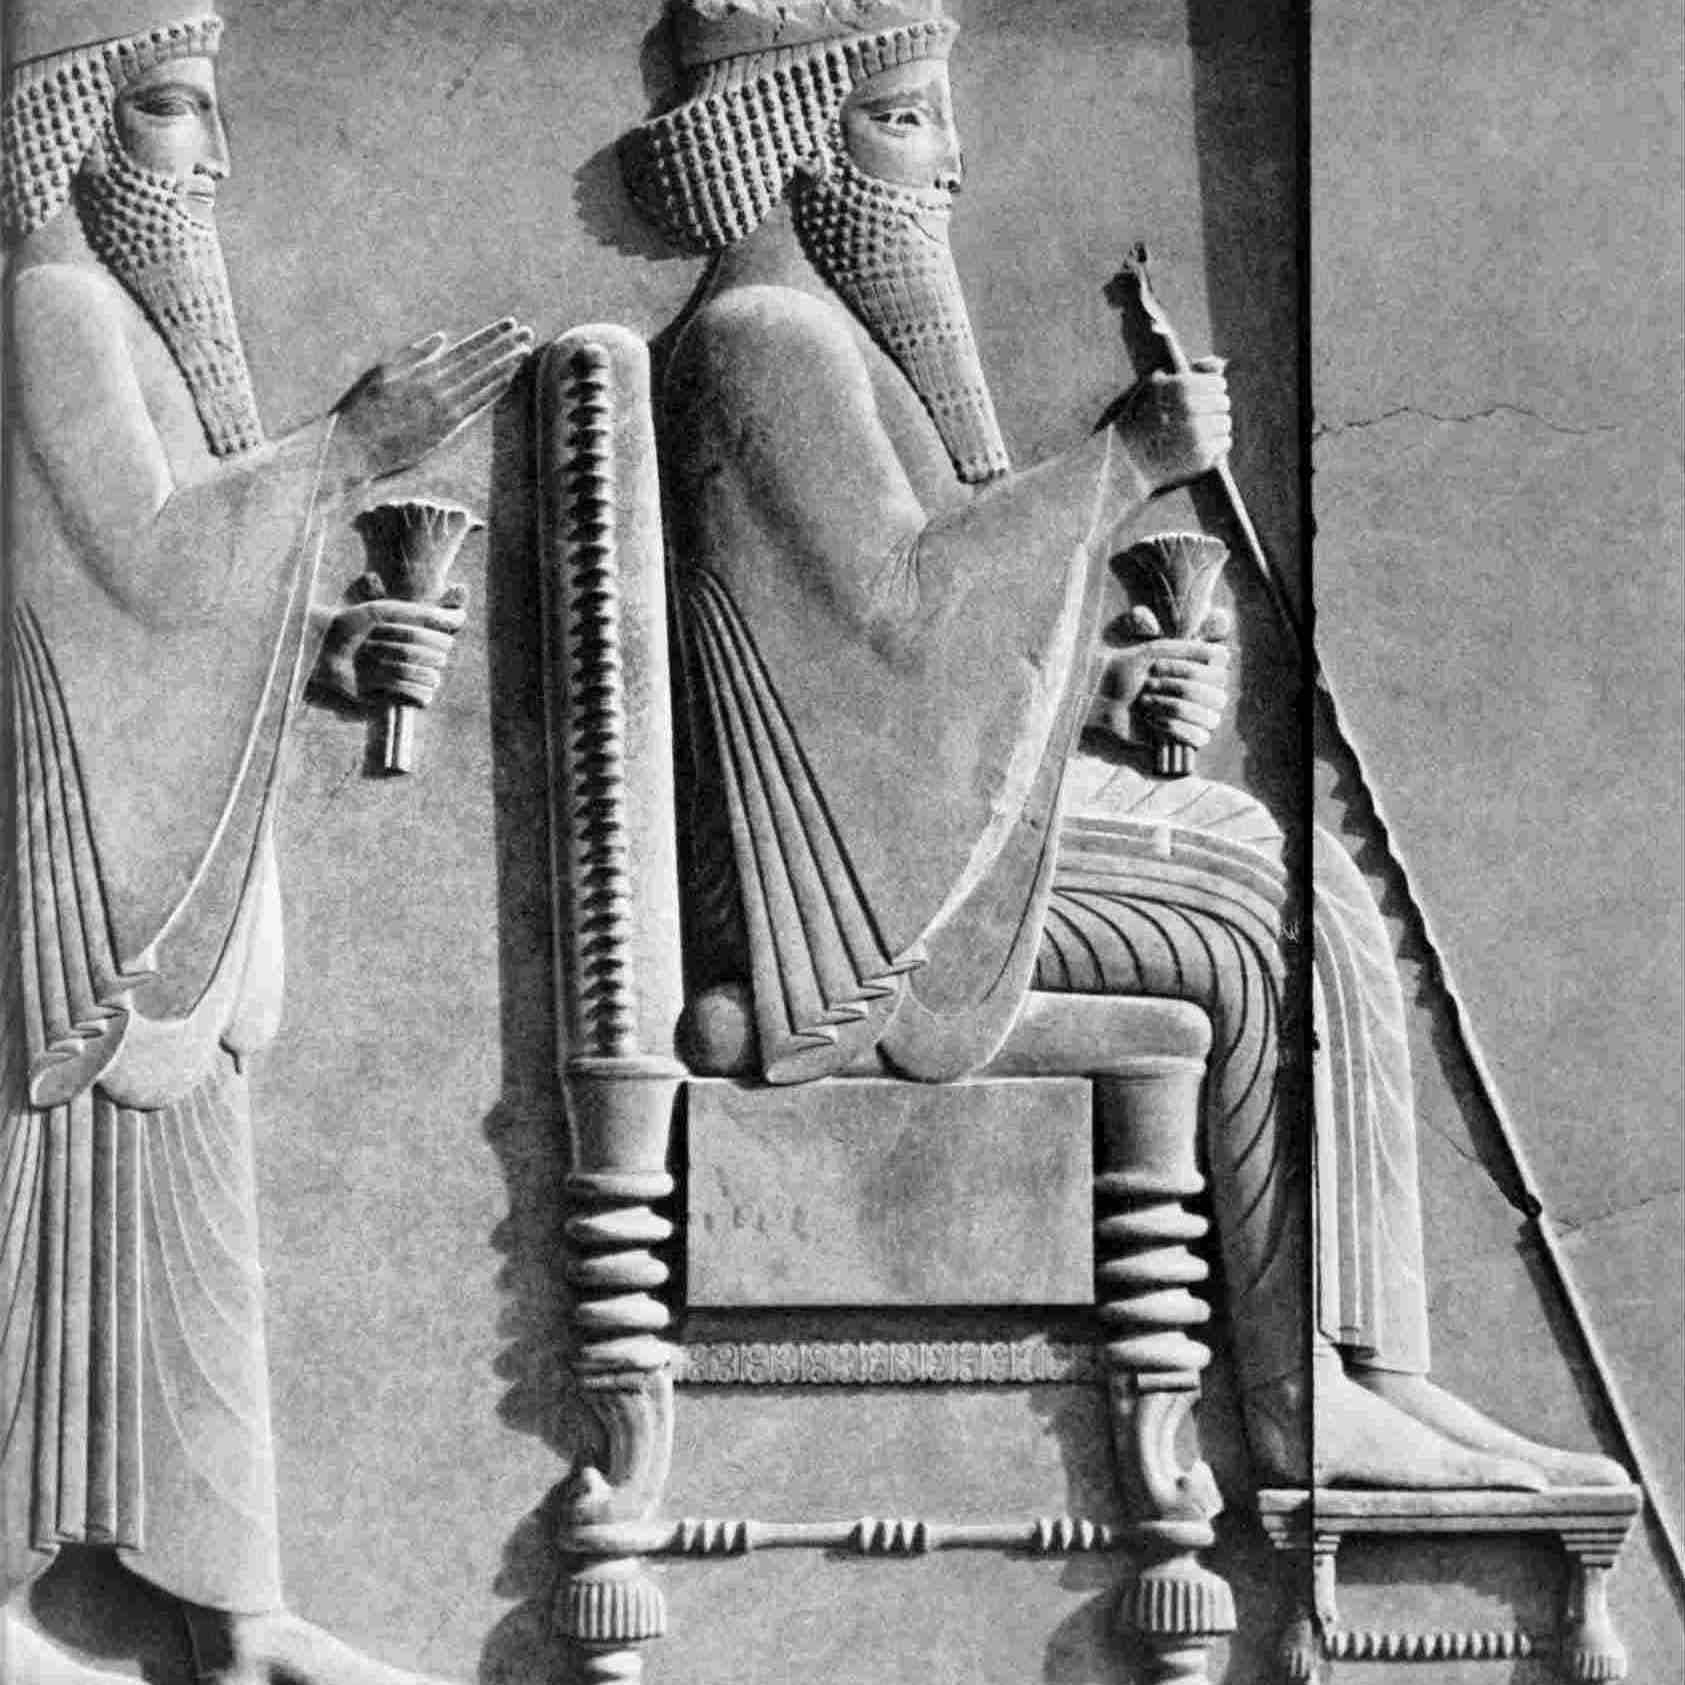 Darius I Receiving a Median Dignitary Relief Sculpture